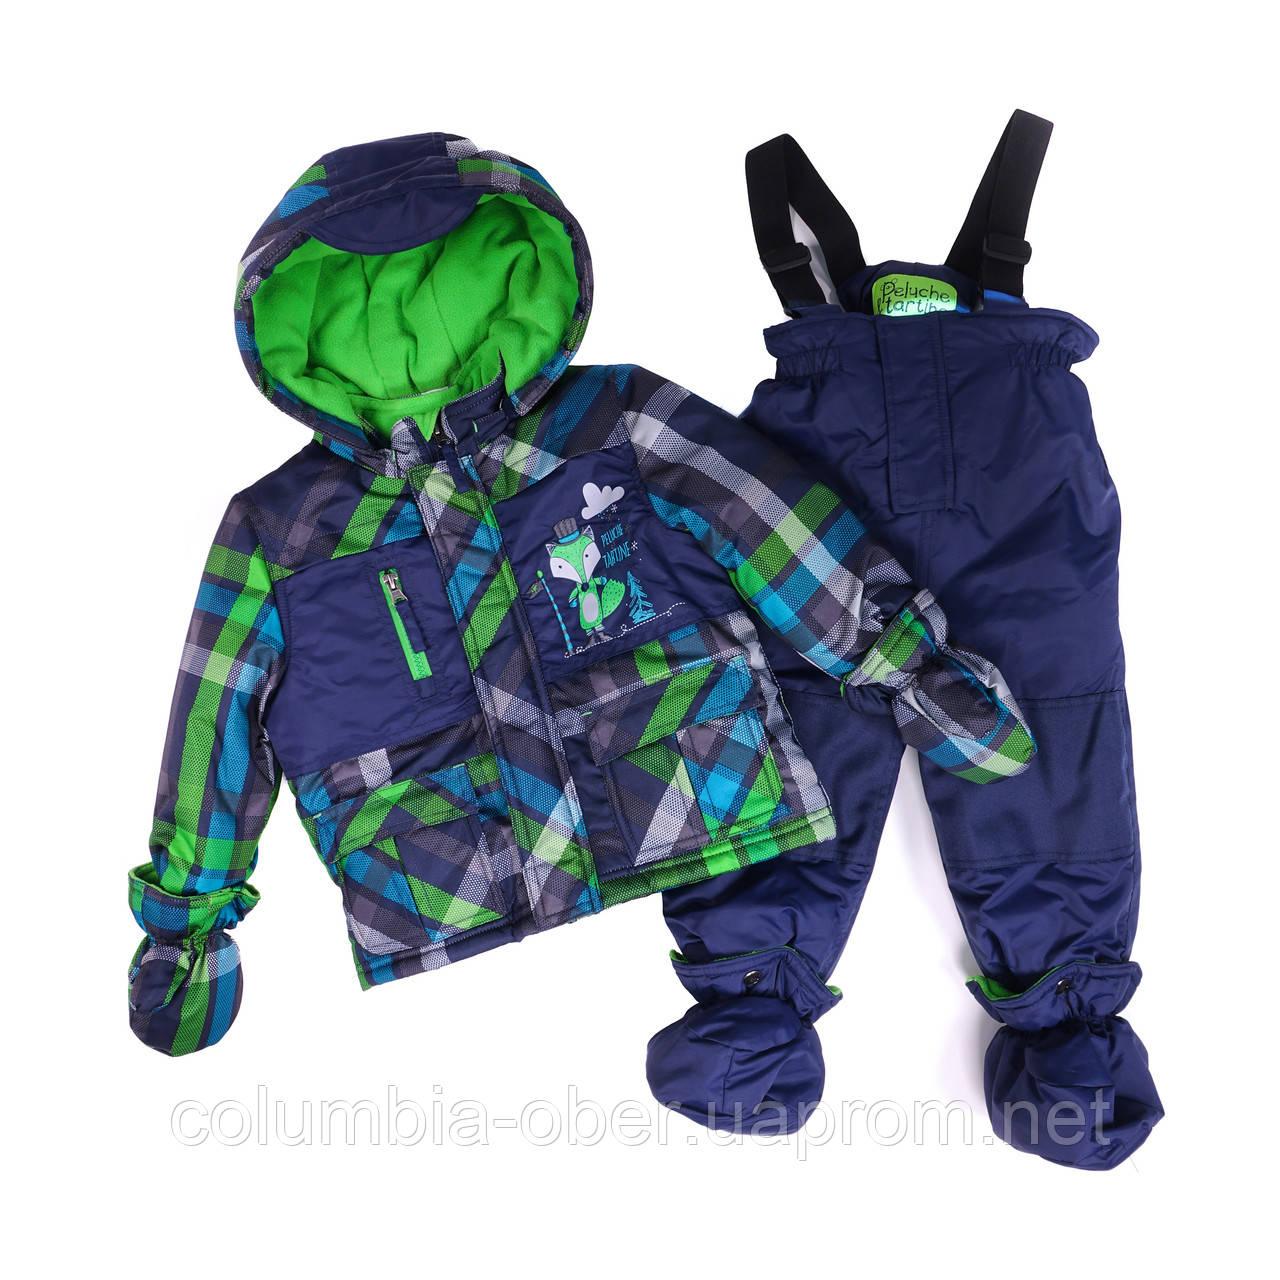 Зимний костюм для мальчика PELUCHE 03 BG M F16. Размеры 85-97.